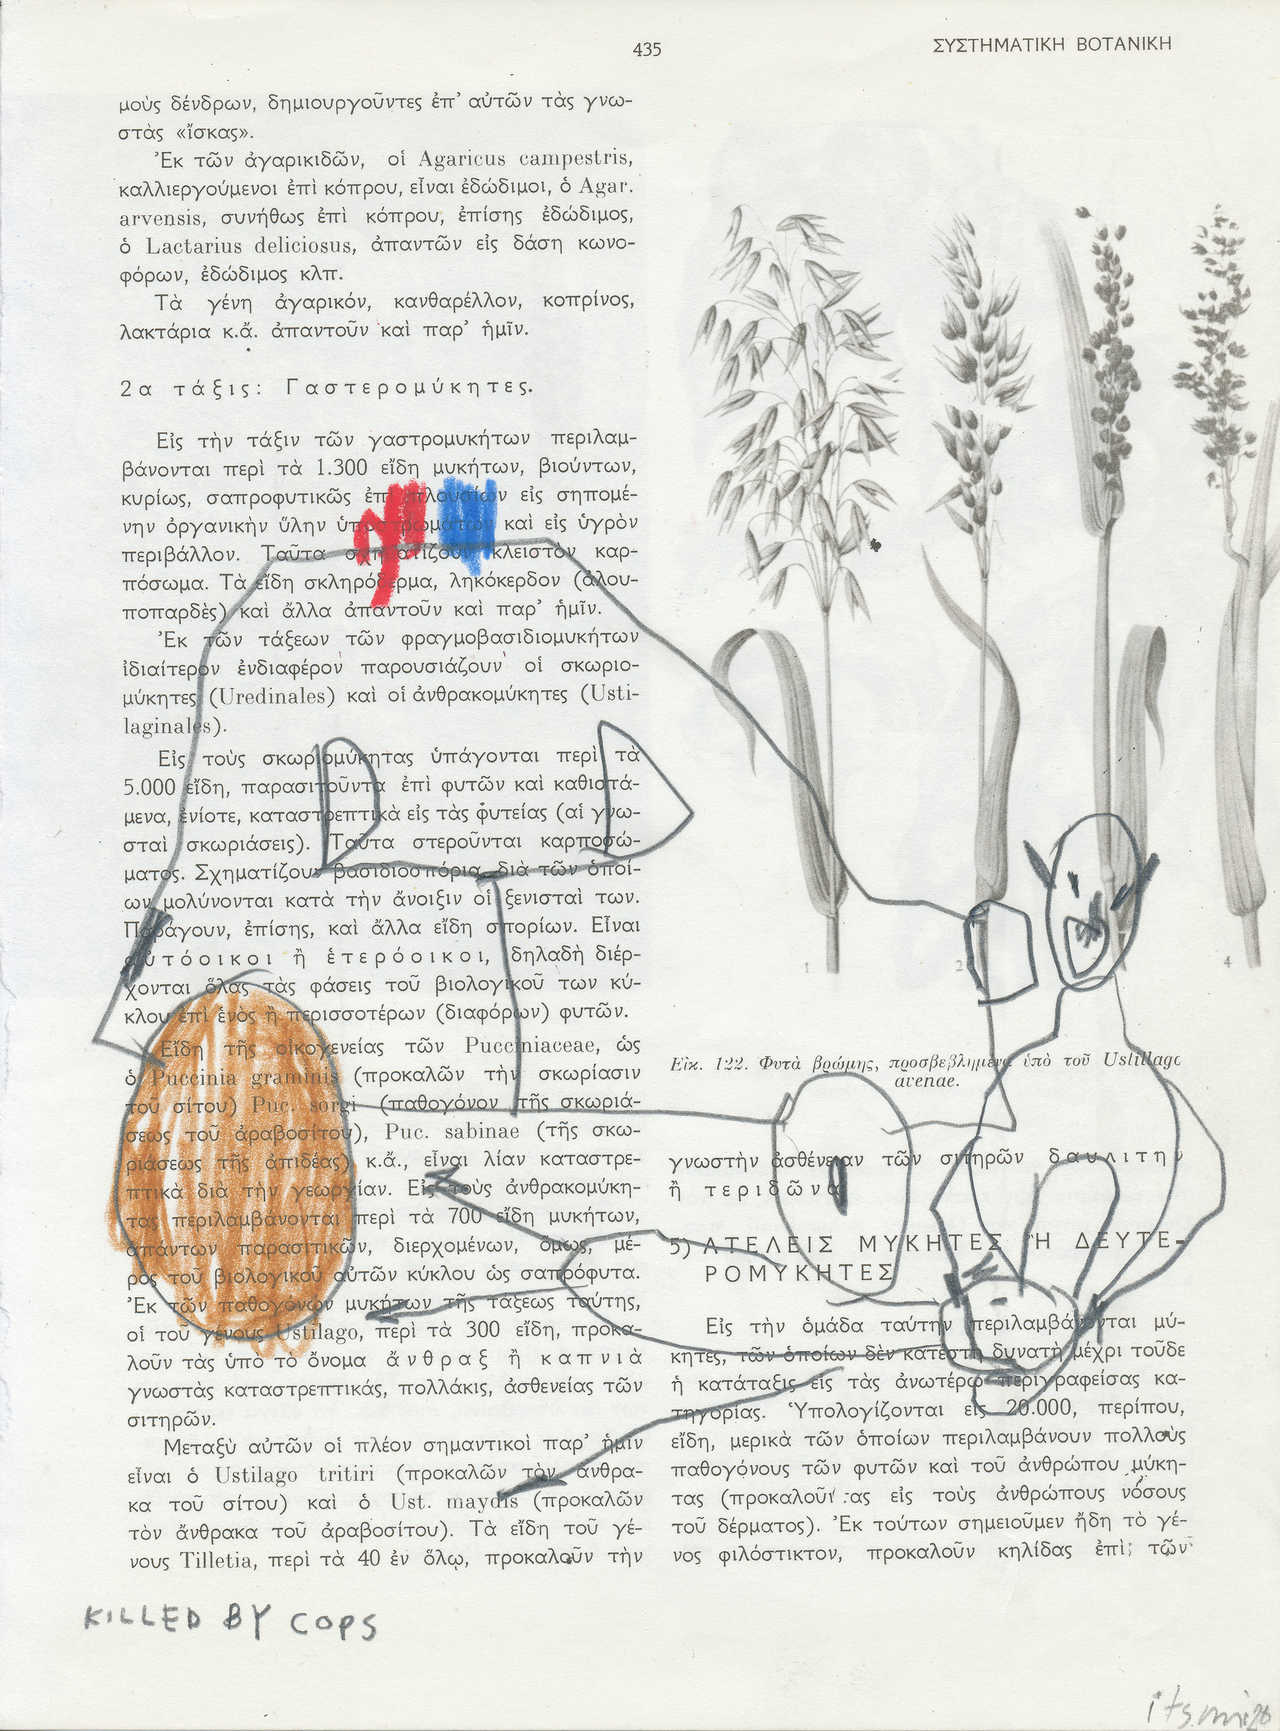 Killed by cops, 2020, μολύβι και ξυλομπογιές σε σελίδα βιβλίου Βοτανικής, 28Χ20,5 εκ.